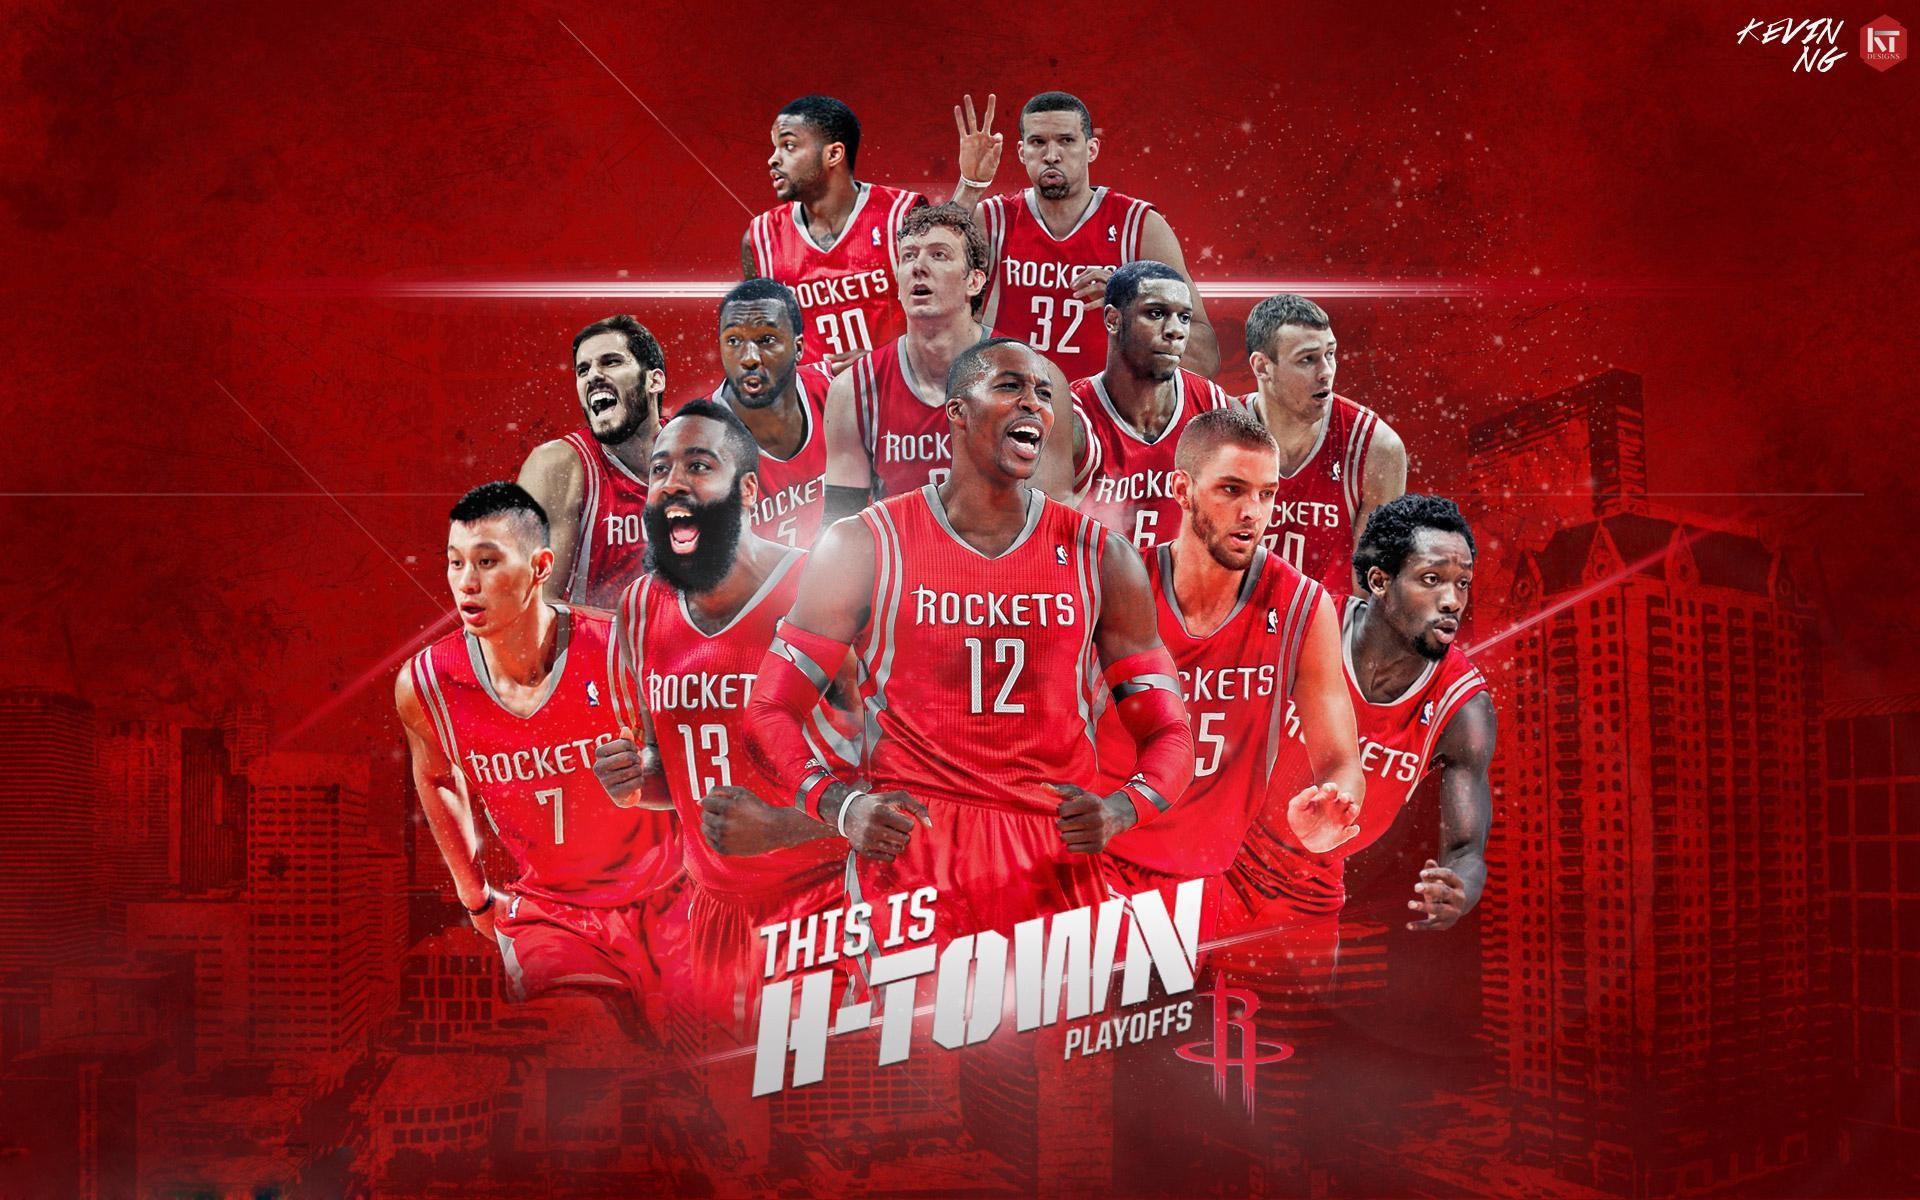 Houston-Rockets-Wallpapers-NBA-Playoffs